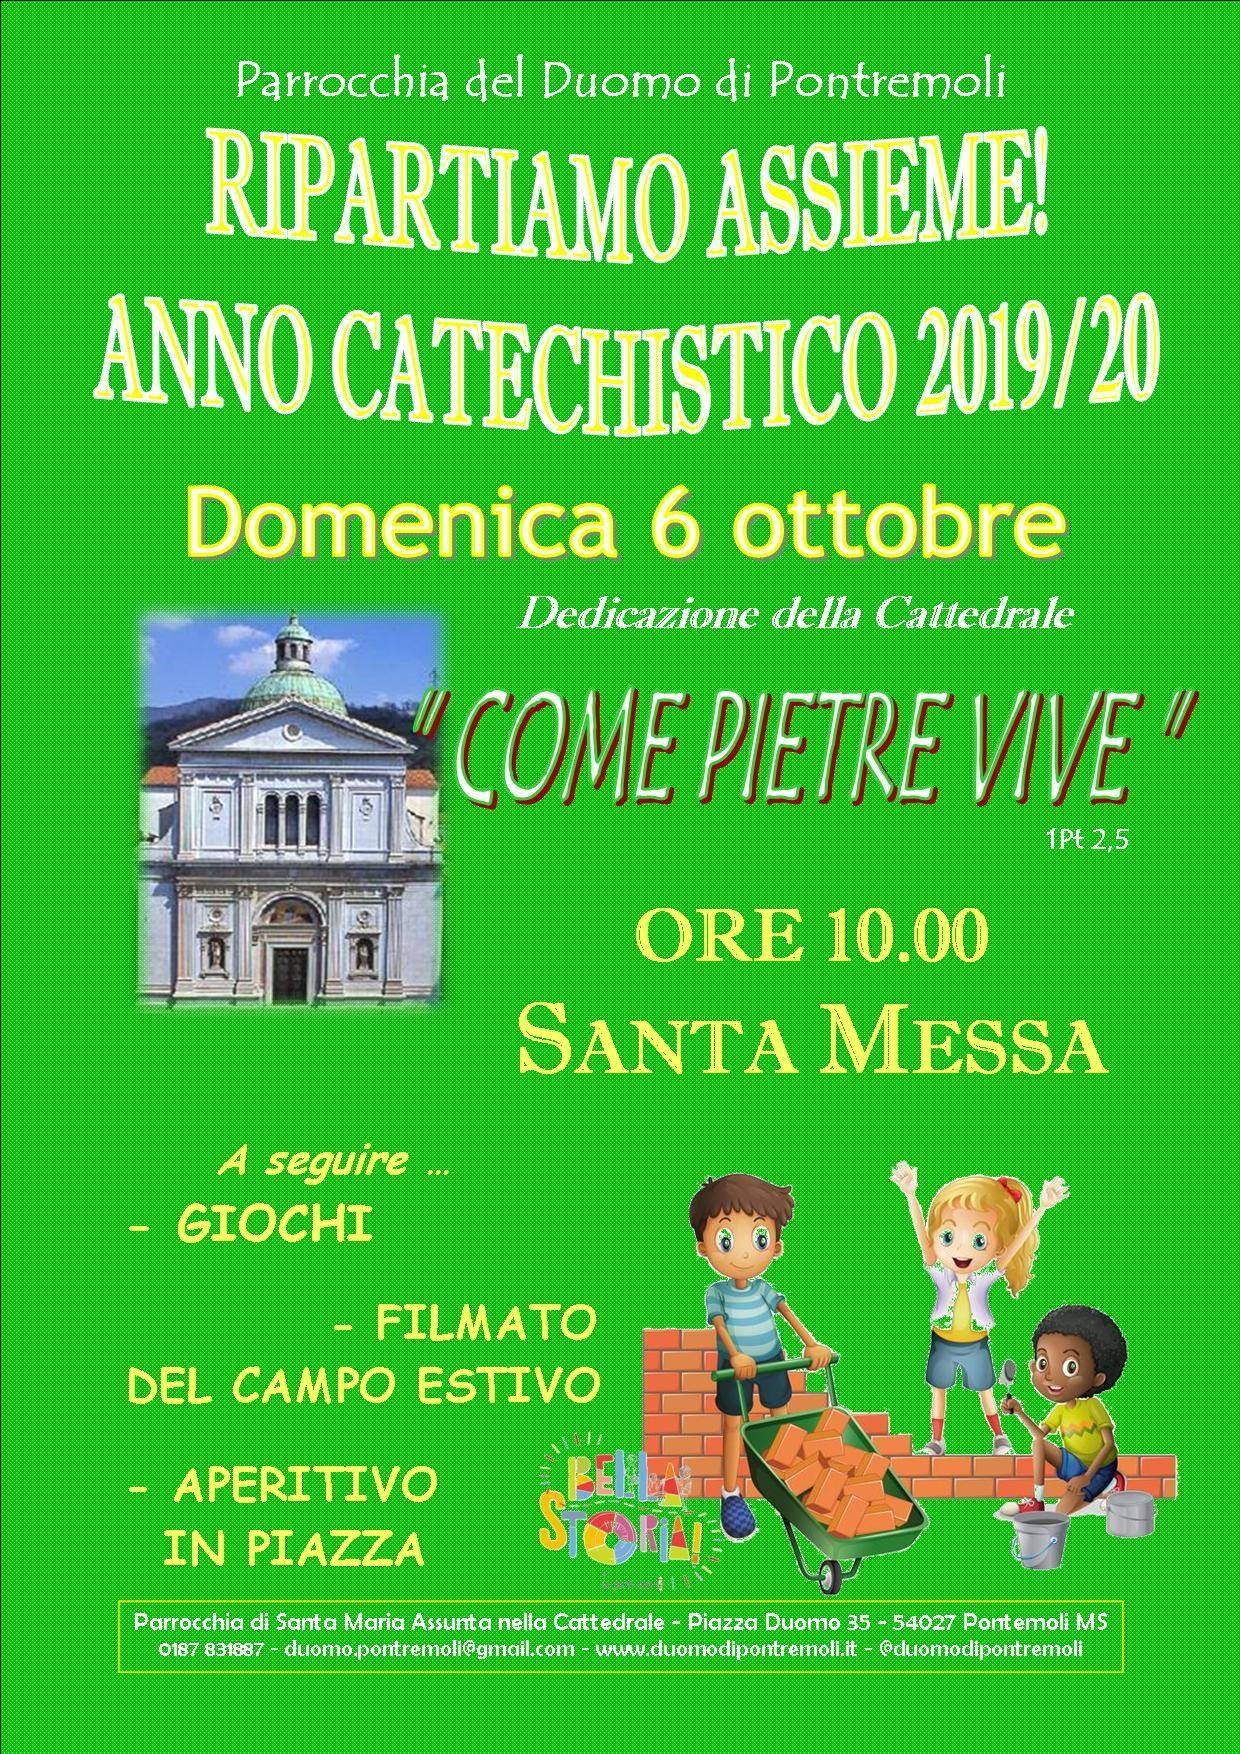 inizio catechismo 2019-20